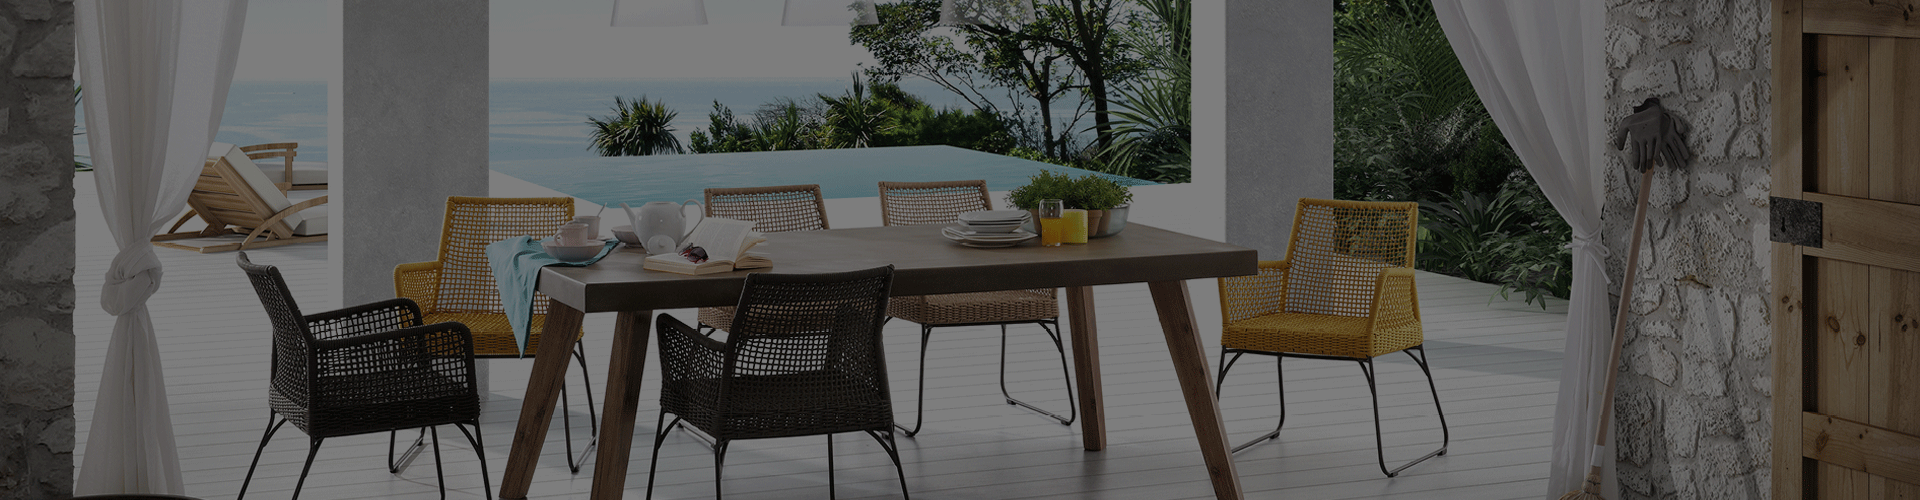 La casa moderna mobel arredamenti a modica i mobili - Arredamenti casa moderna ...